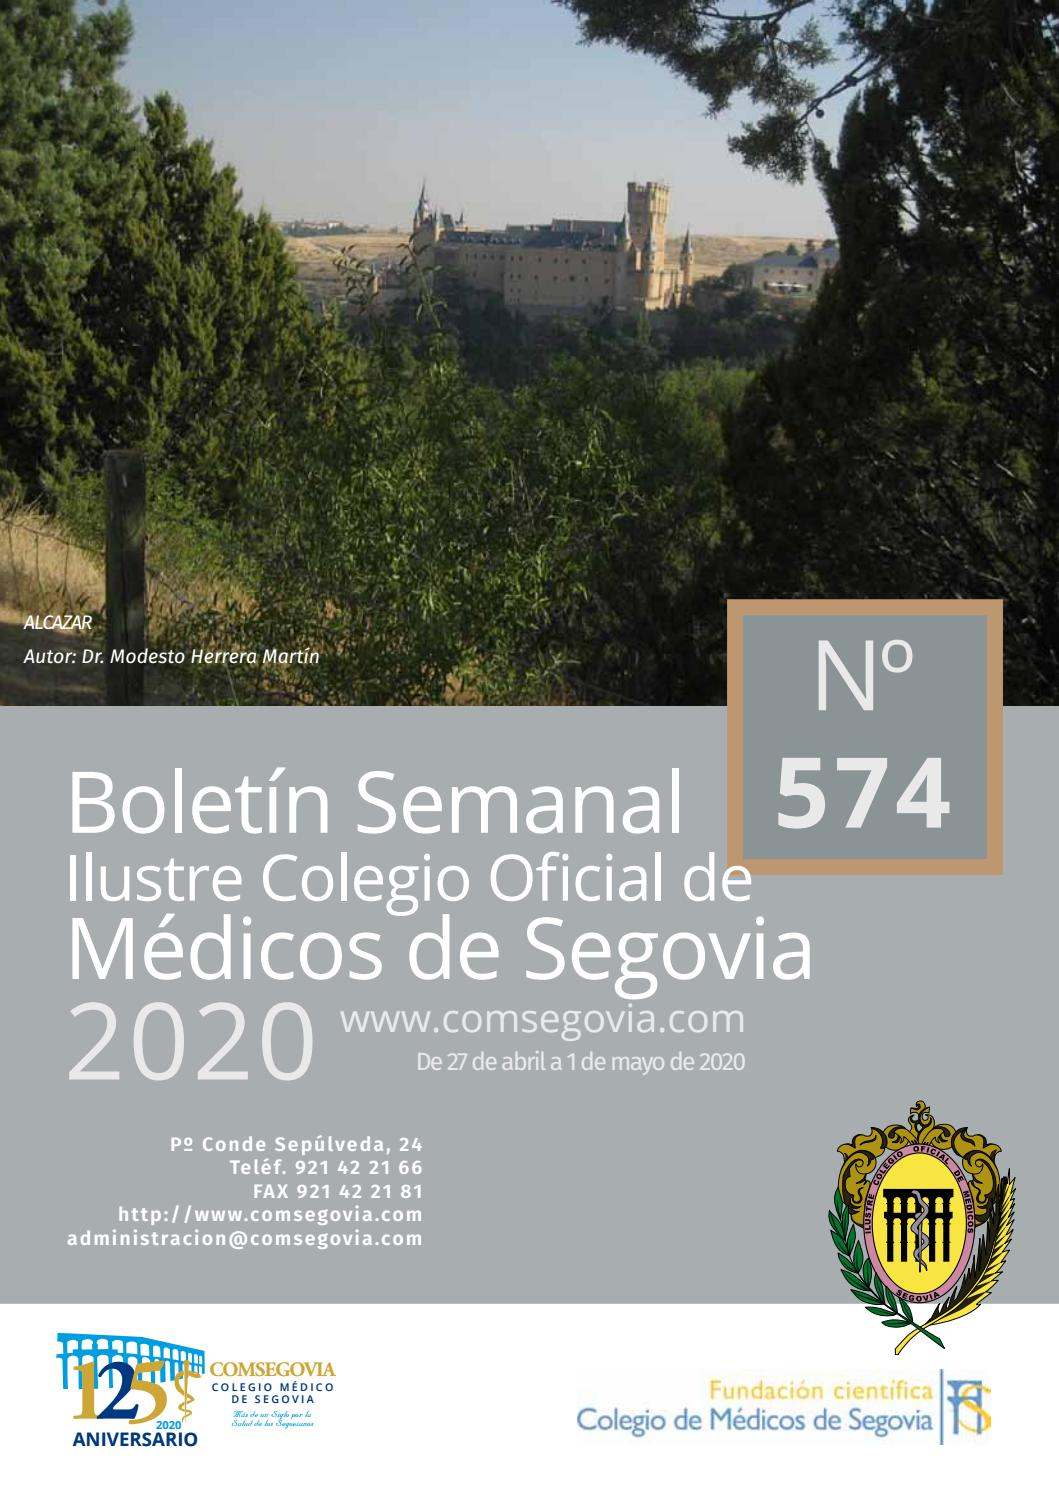 Conocer gente Girona bolívar